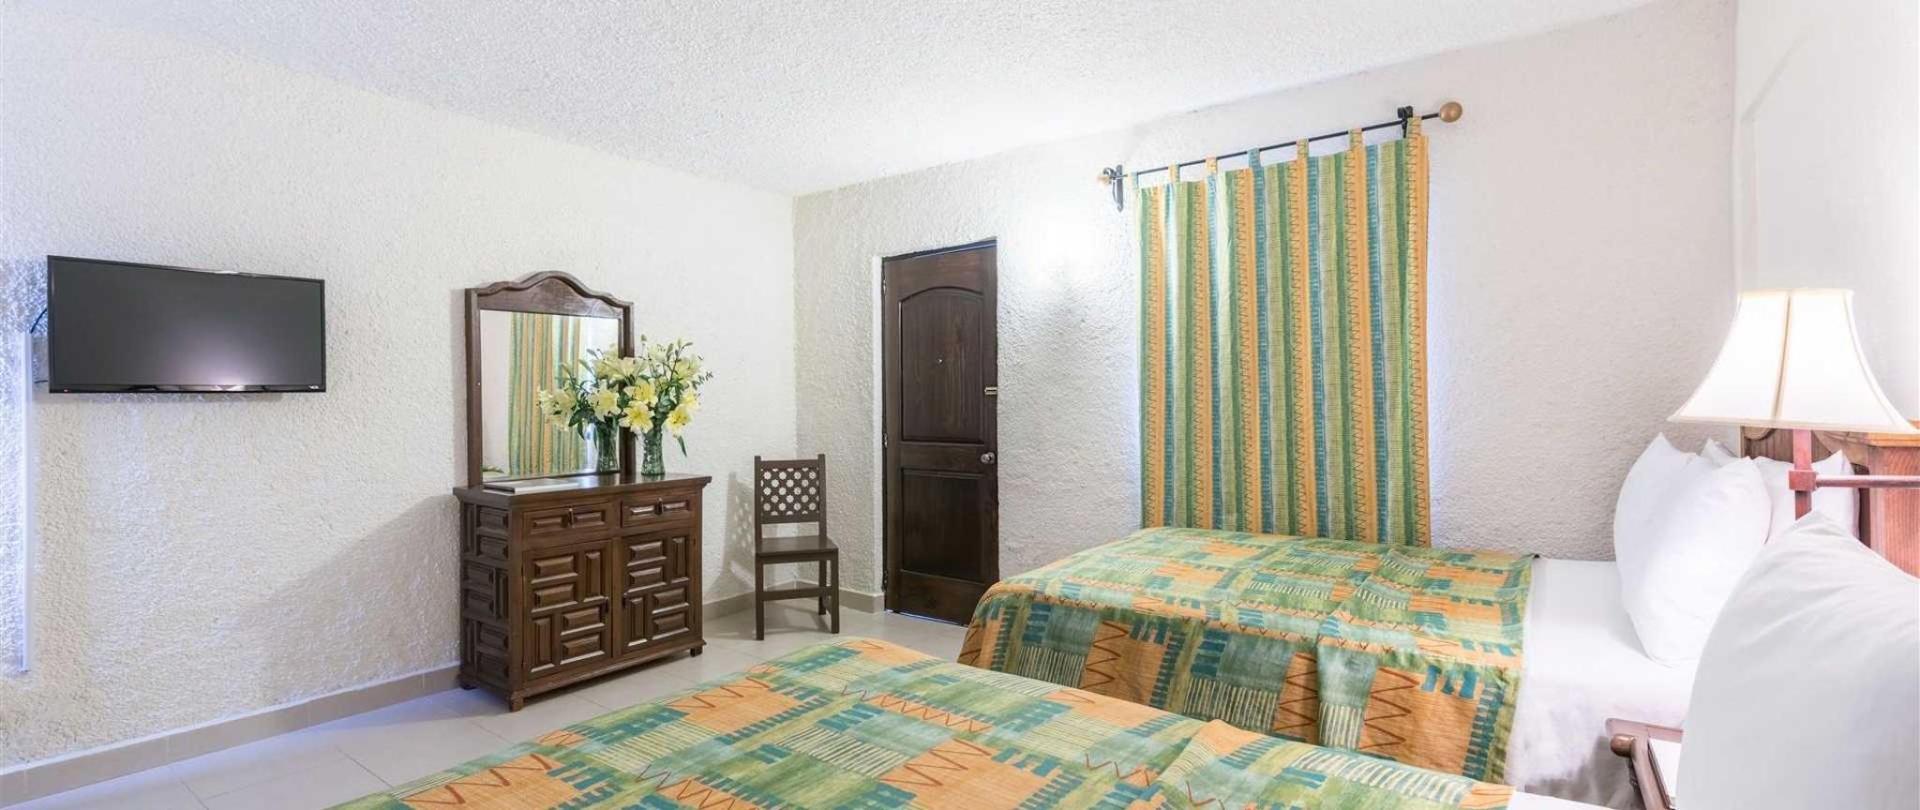 homepage-la-abadia-hotel-guanajuato-mexico7.jpeg